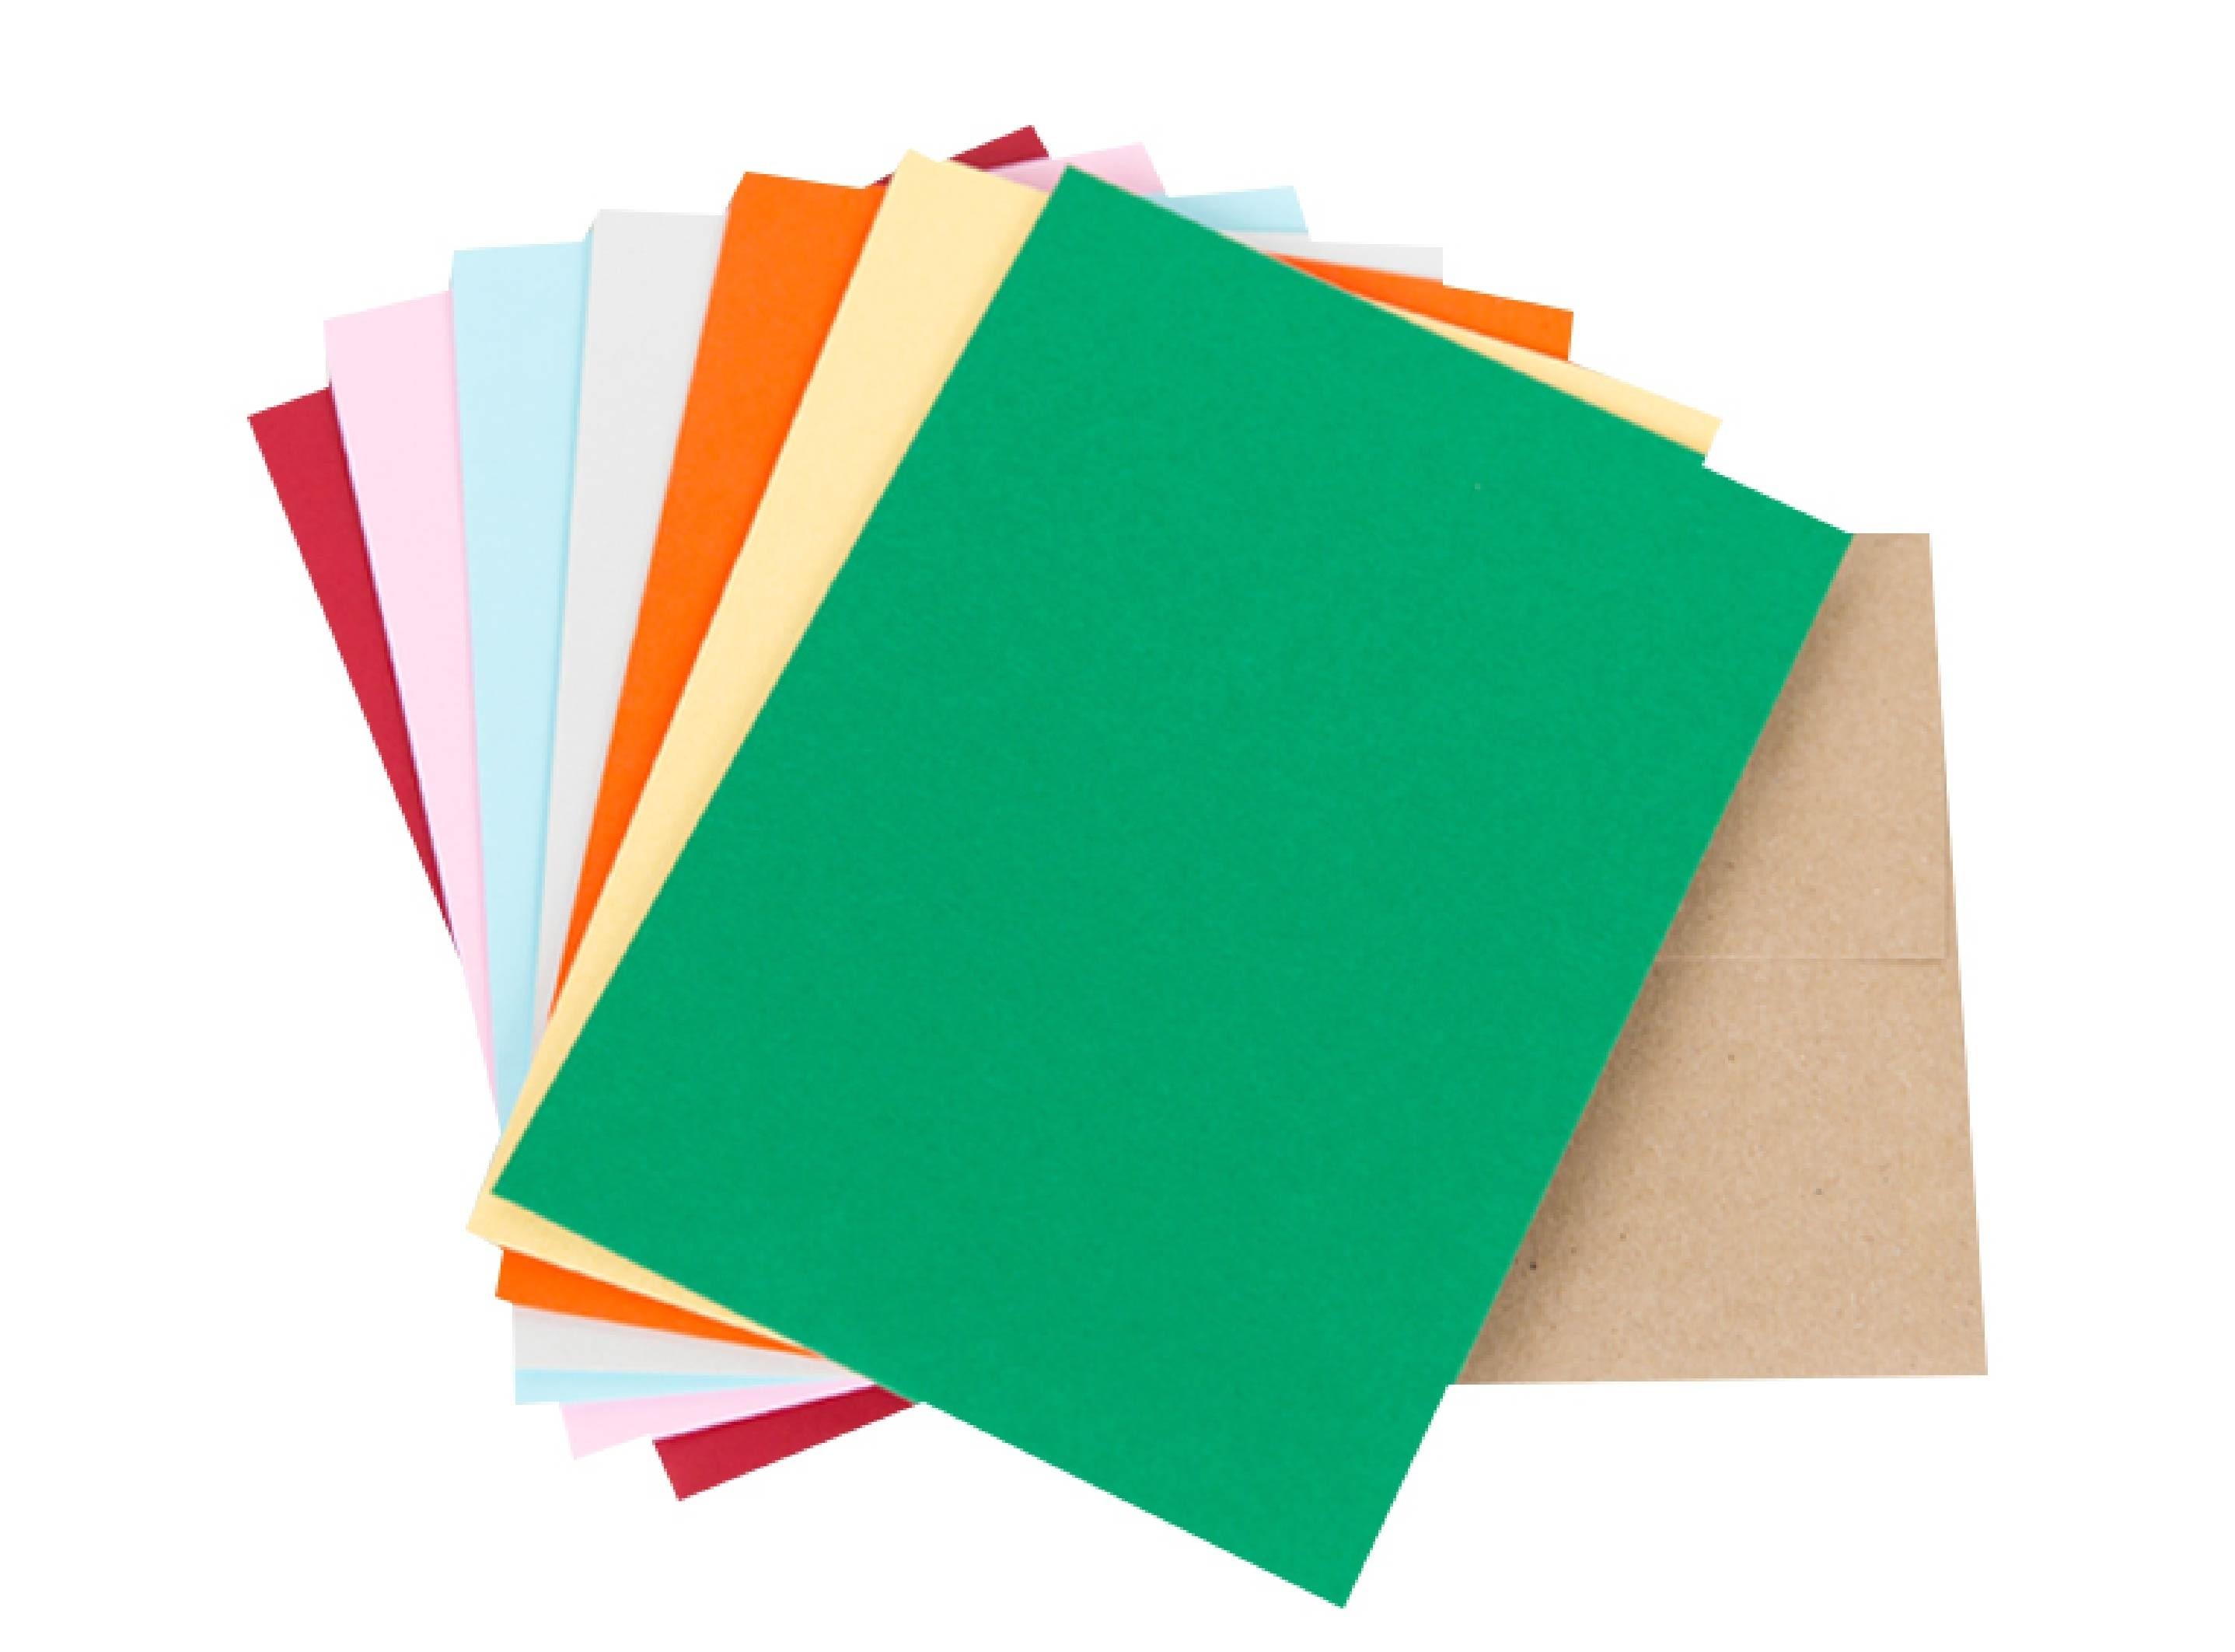 5x5 envelope fits 5